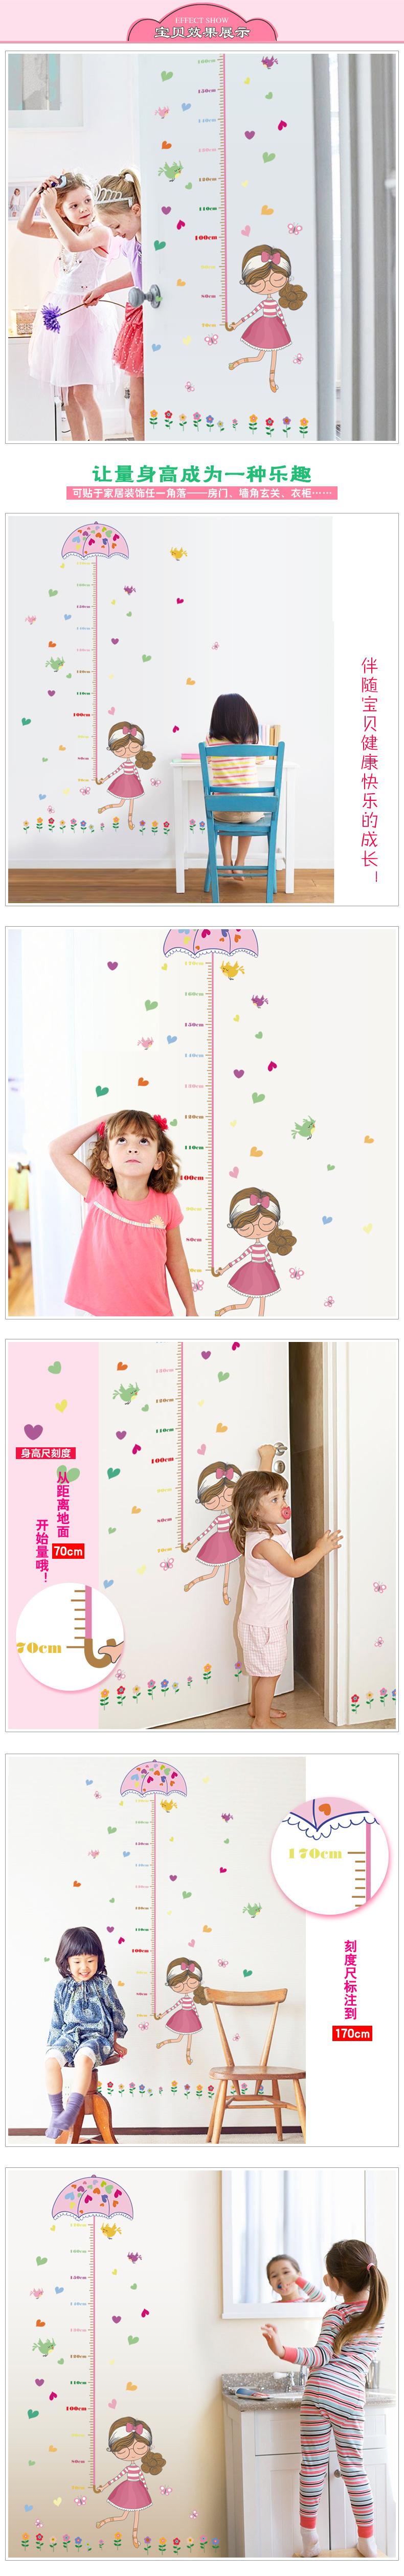 umbrella measure height girl removable vinyl sticker decal baby room decor JH